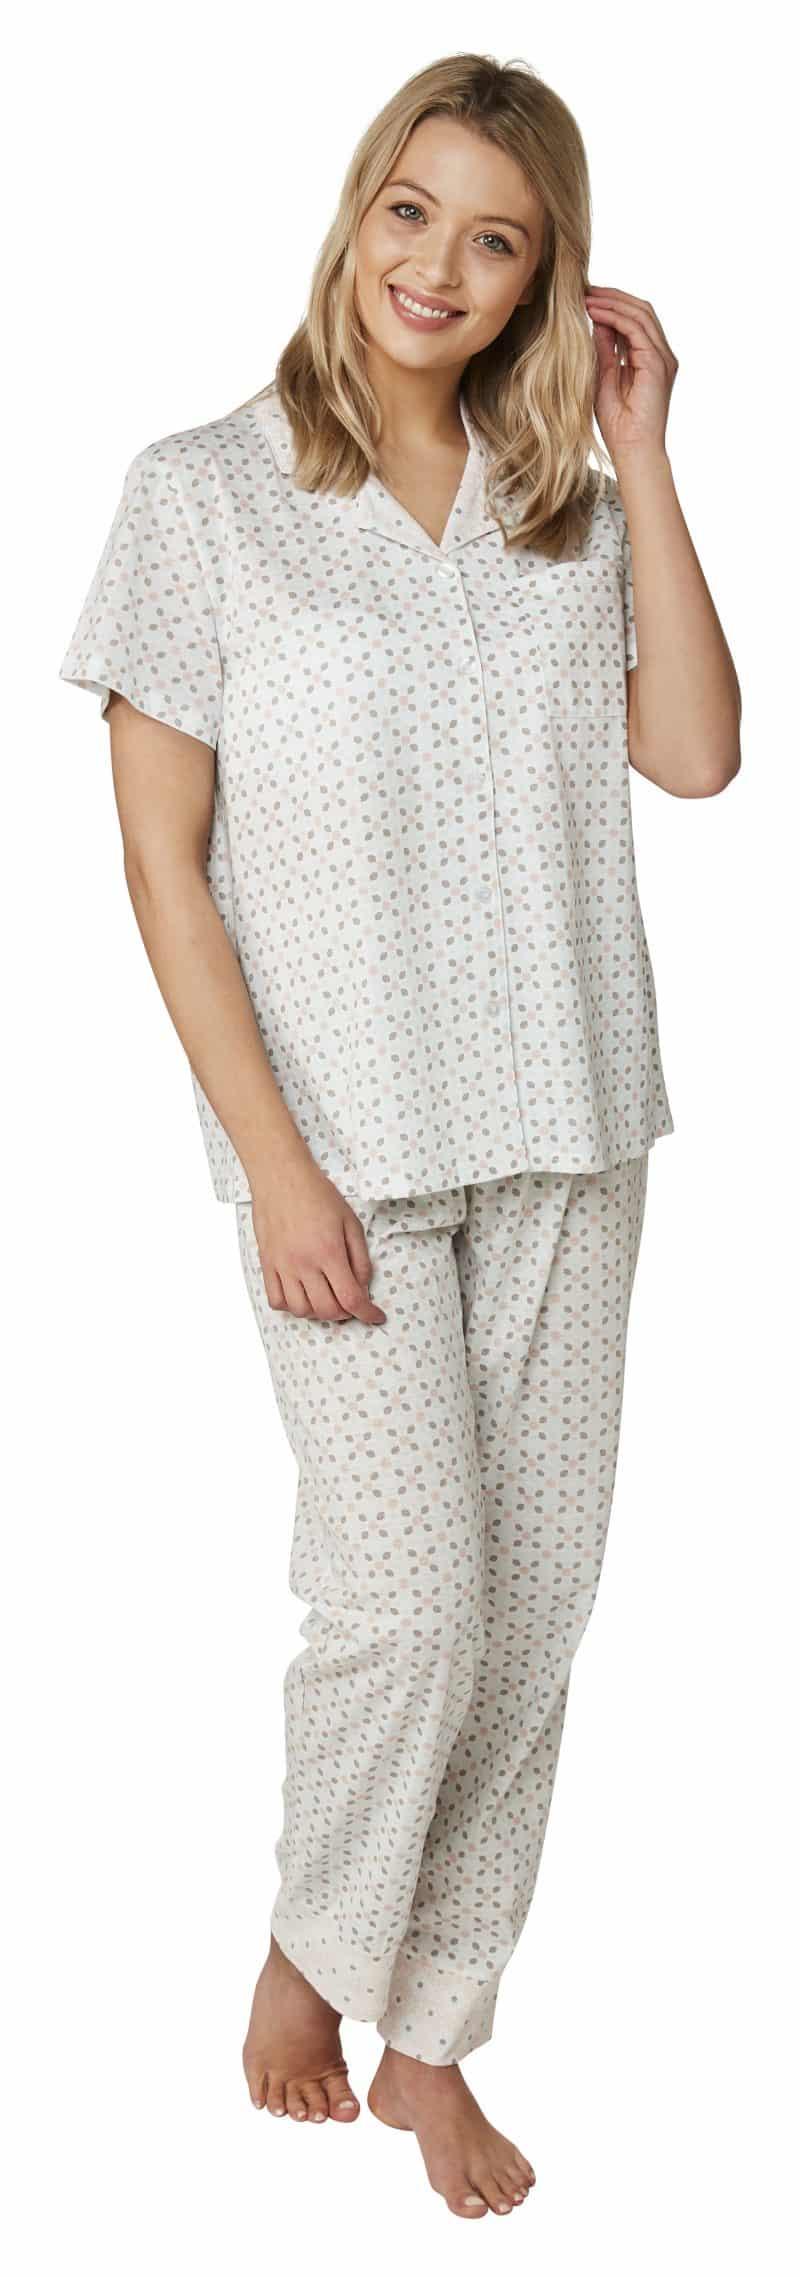 Mosaic Print Pyjamas Marlon Ma22790